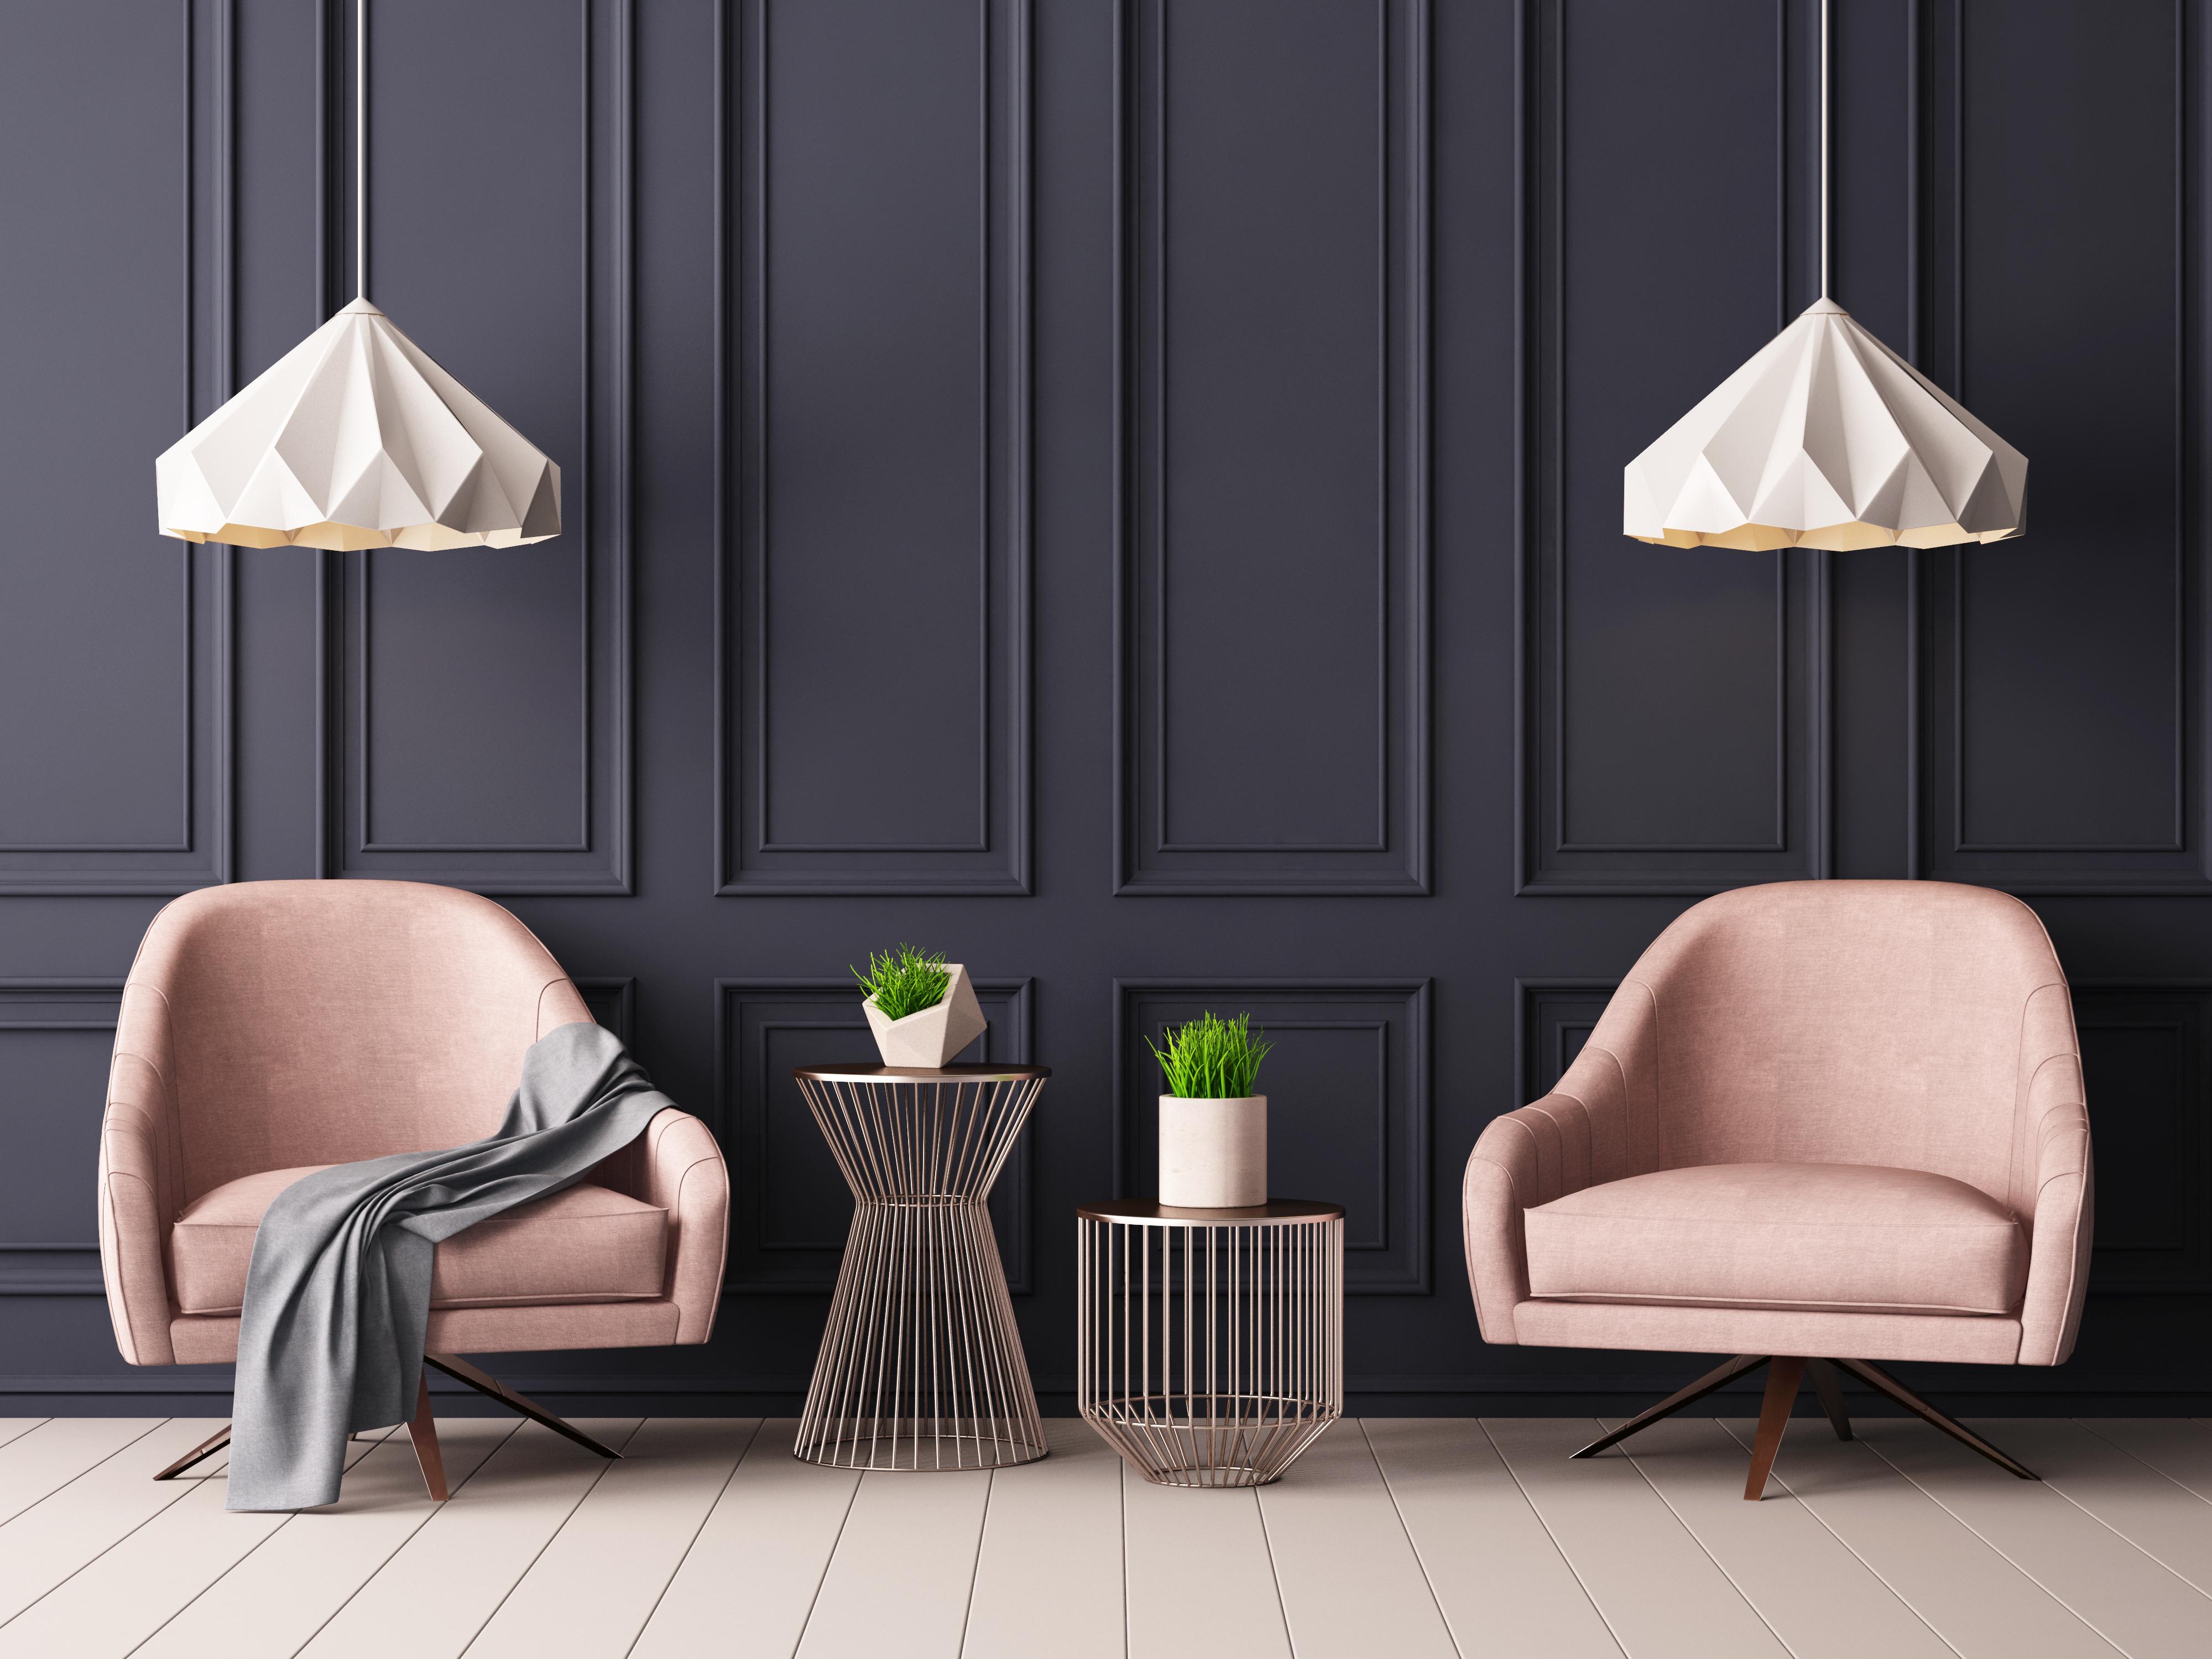 Alisa Murray Interiors     The Serenity in Symmetry!